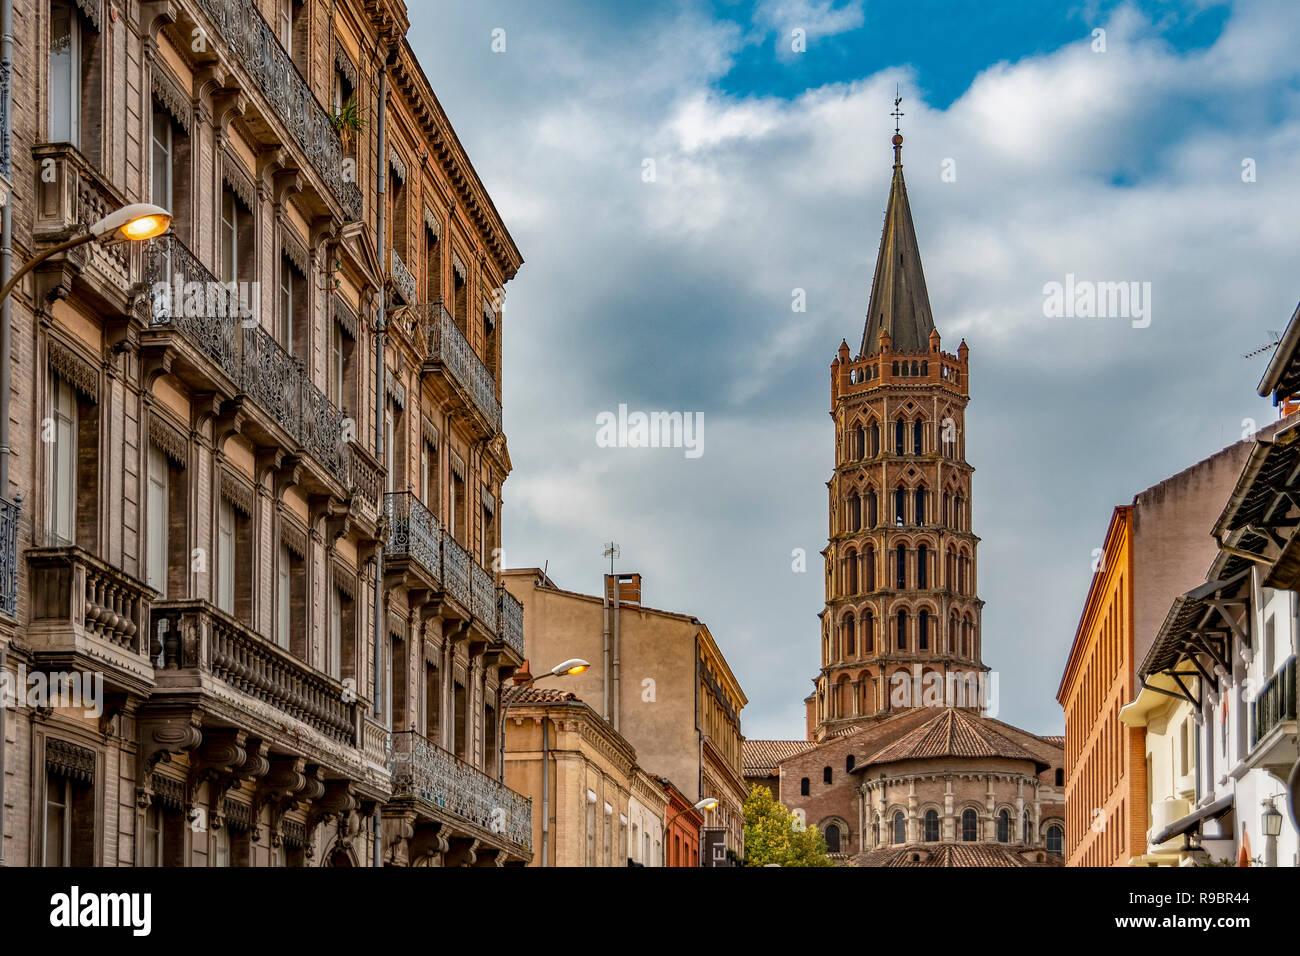 France. Haute-Garonne (31), Toulouse. Dome of the Saint-Sernin Basilica Stock Photo